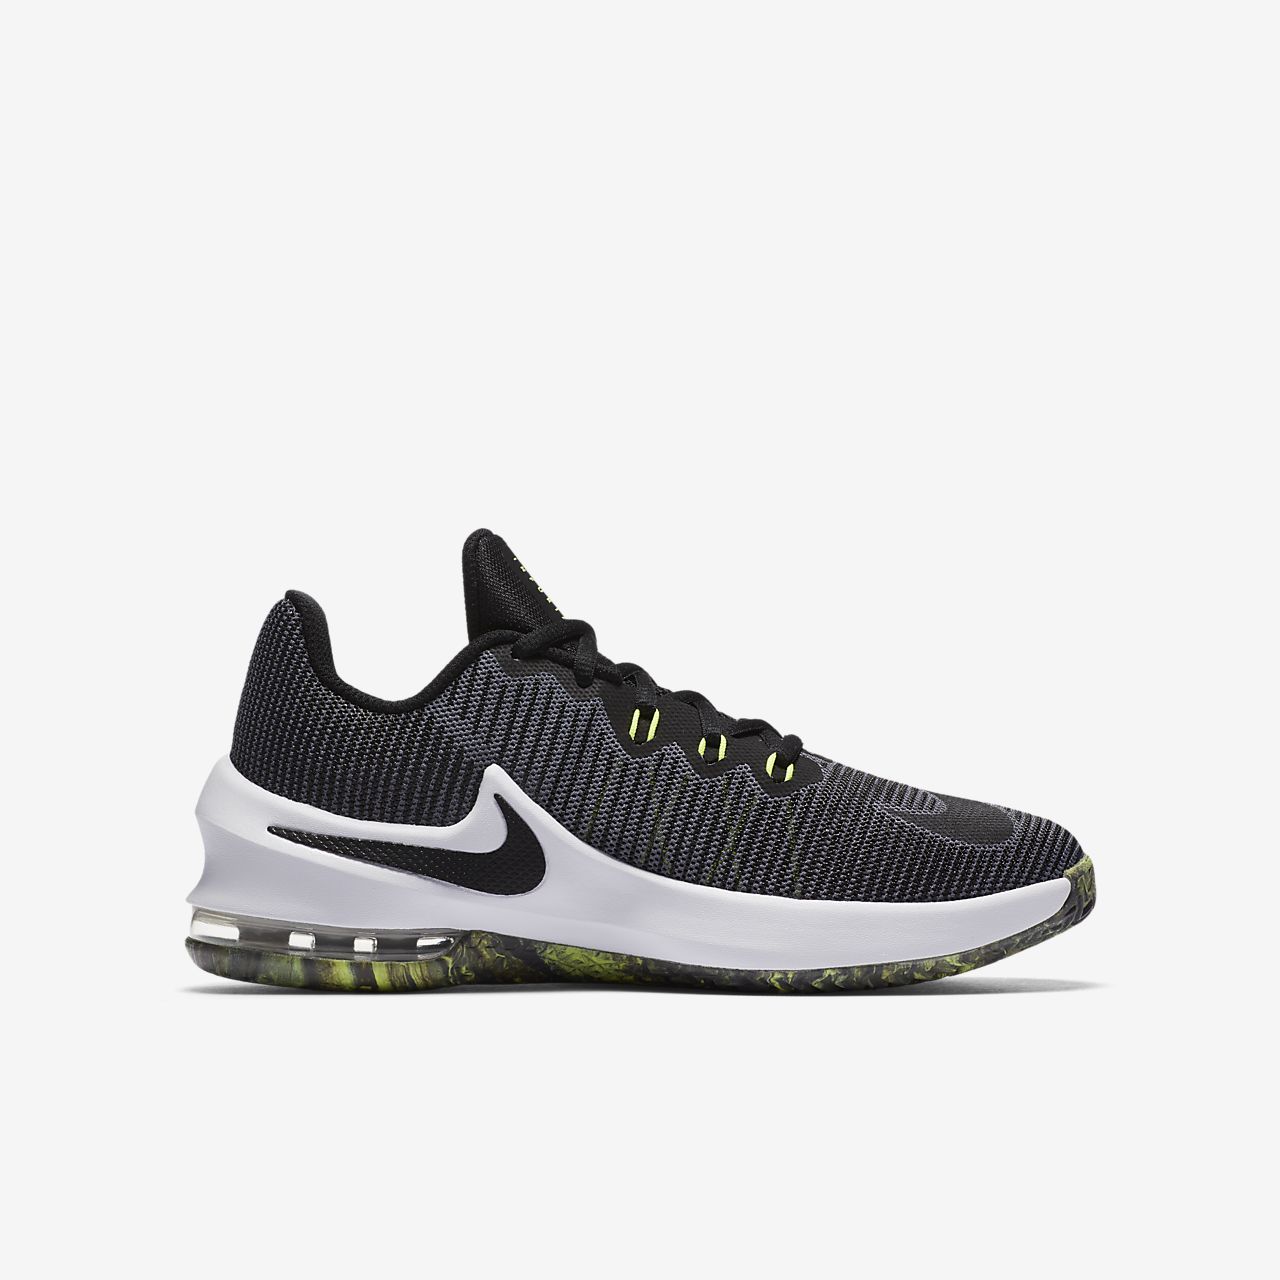 pretty nice 6bcc9 0280d NikeAir Max Infuriate SneakerKinder blackblackwhitedarkgrey